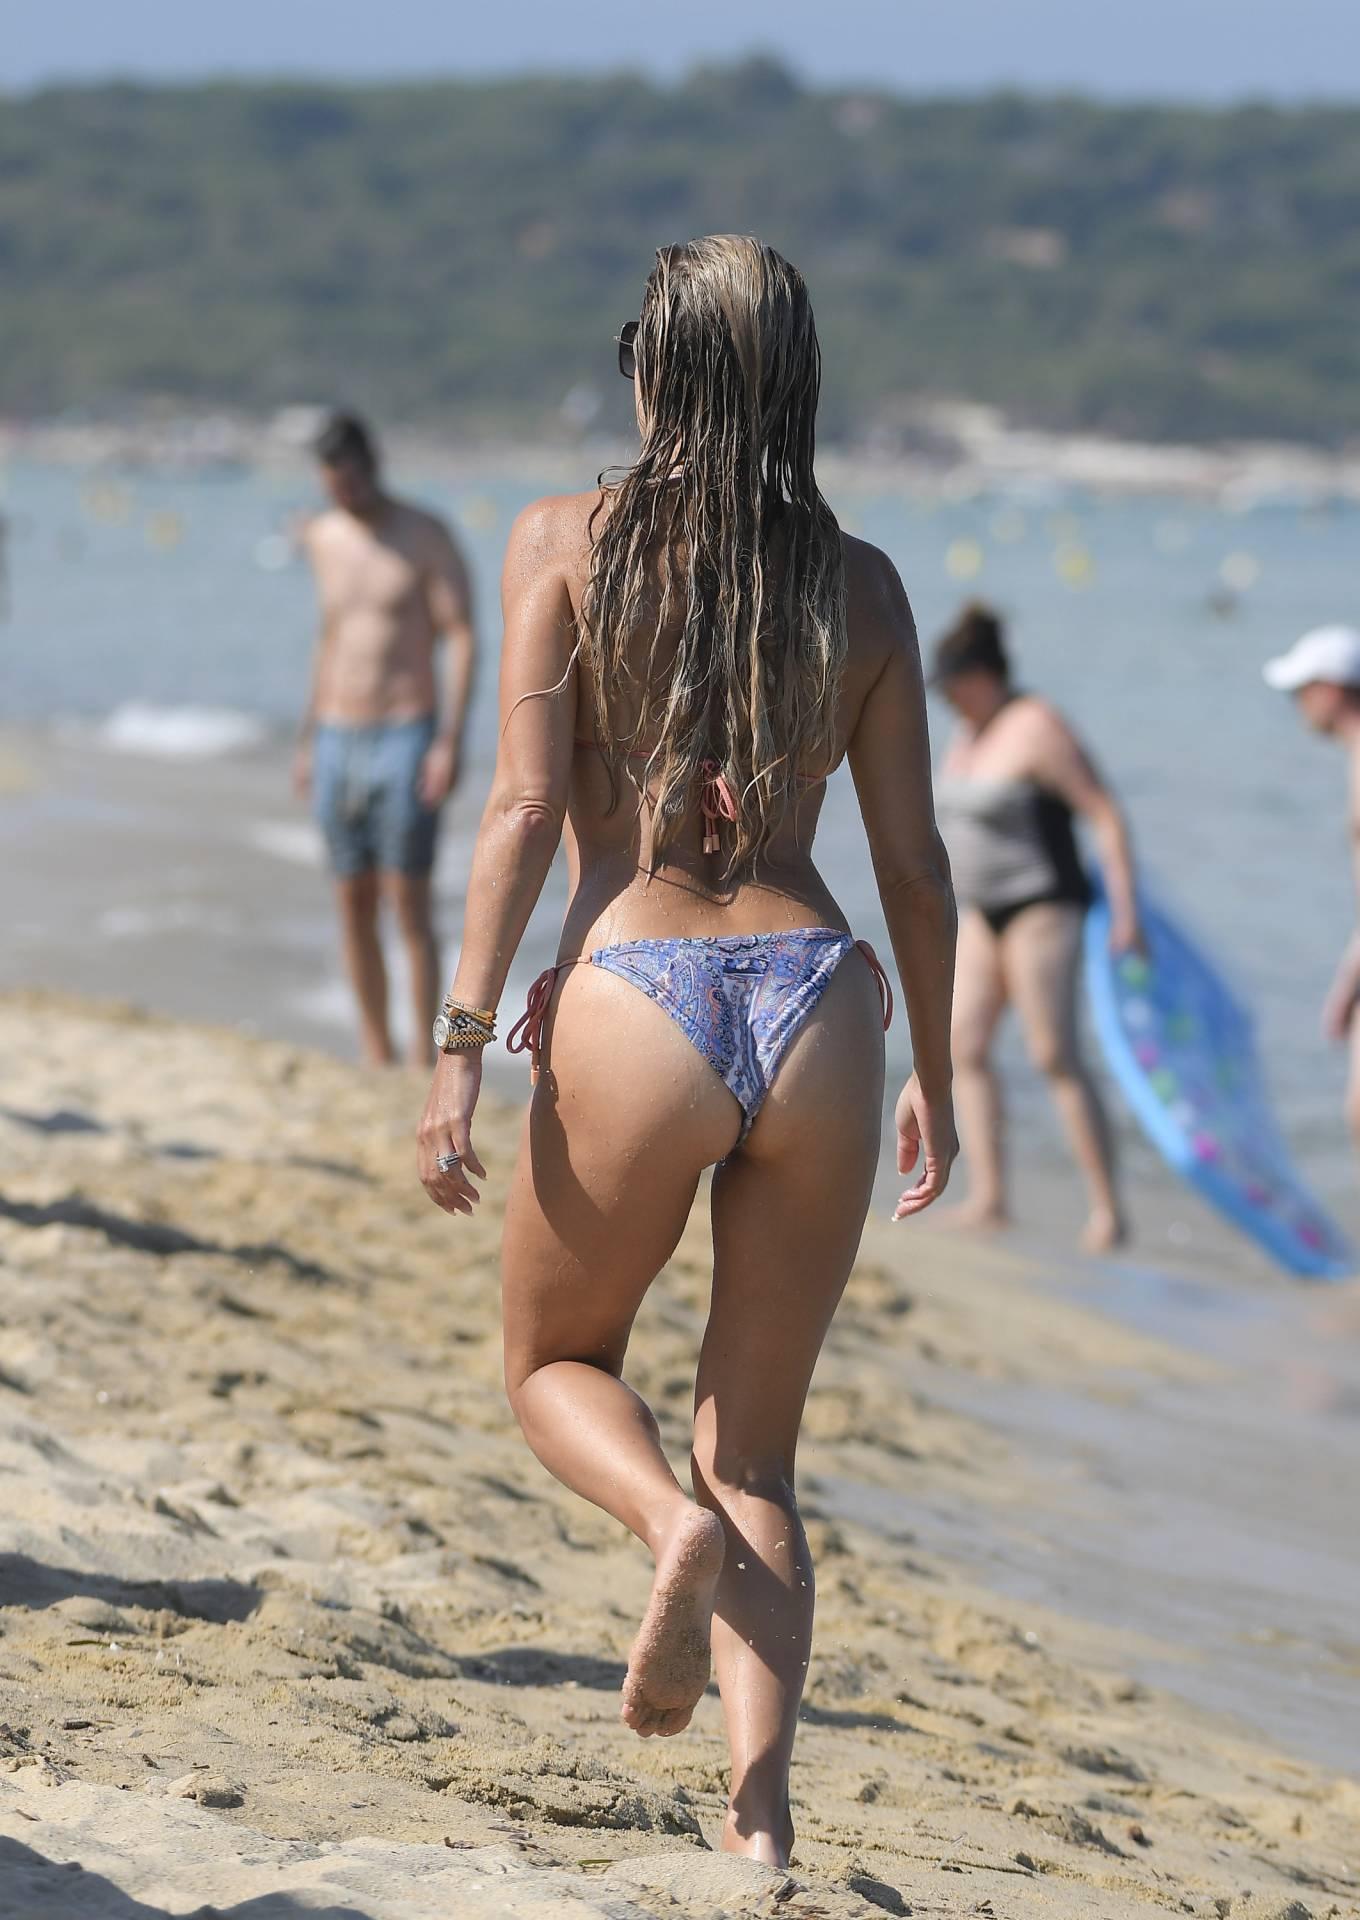 Sylvie Meis 2021 : Sylvie Meis – In a bikini with her husband Niclas Castello on the beach La Réserve in Ramatuelle-30